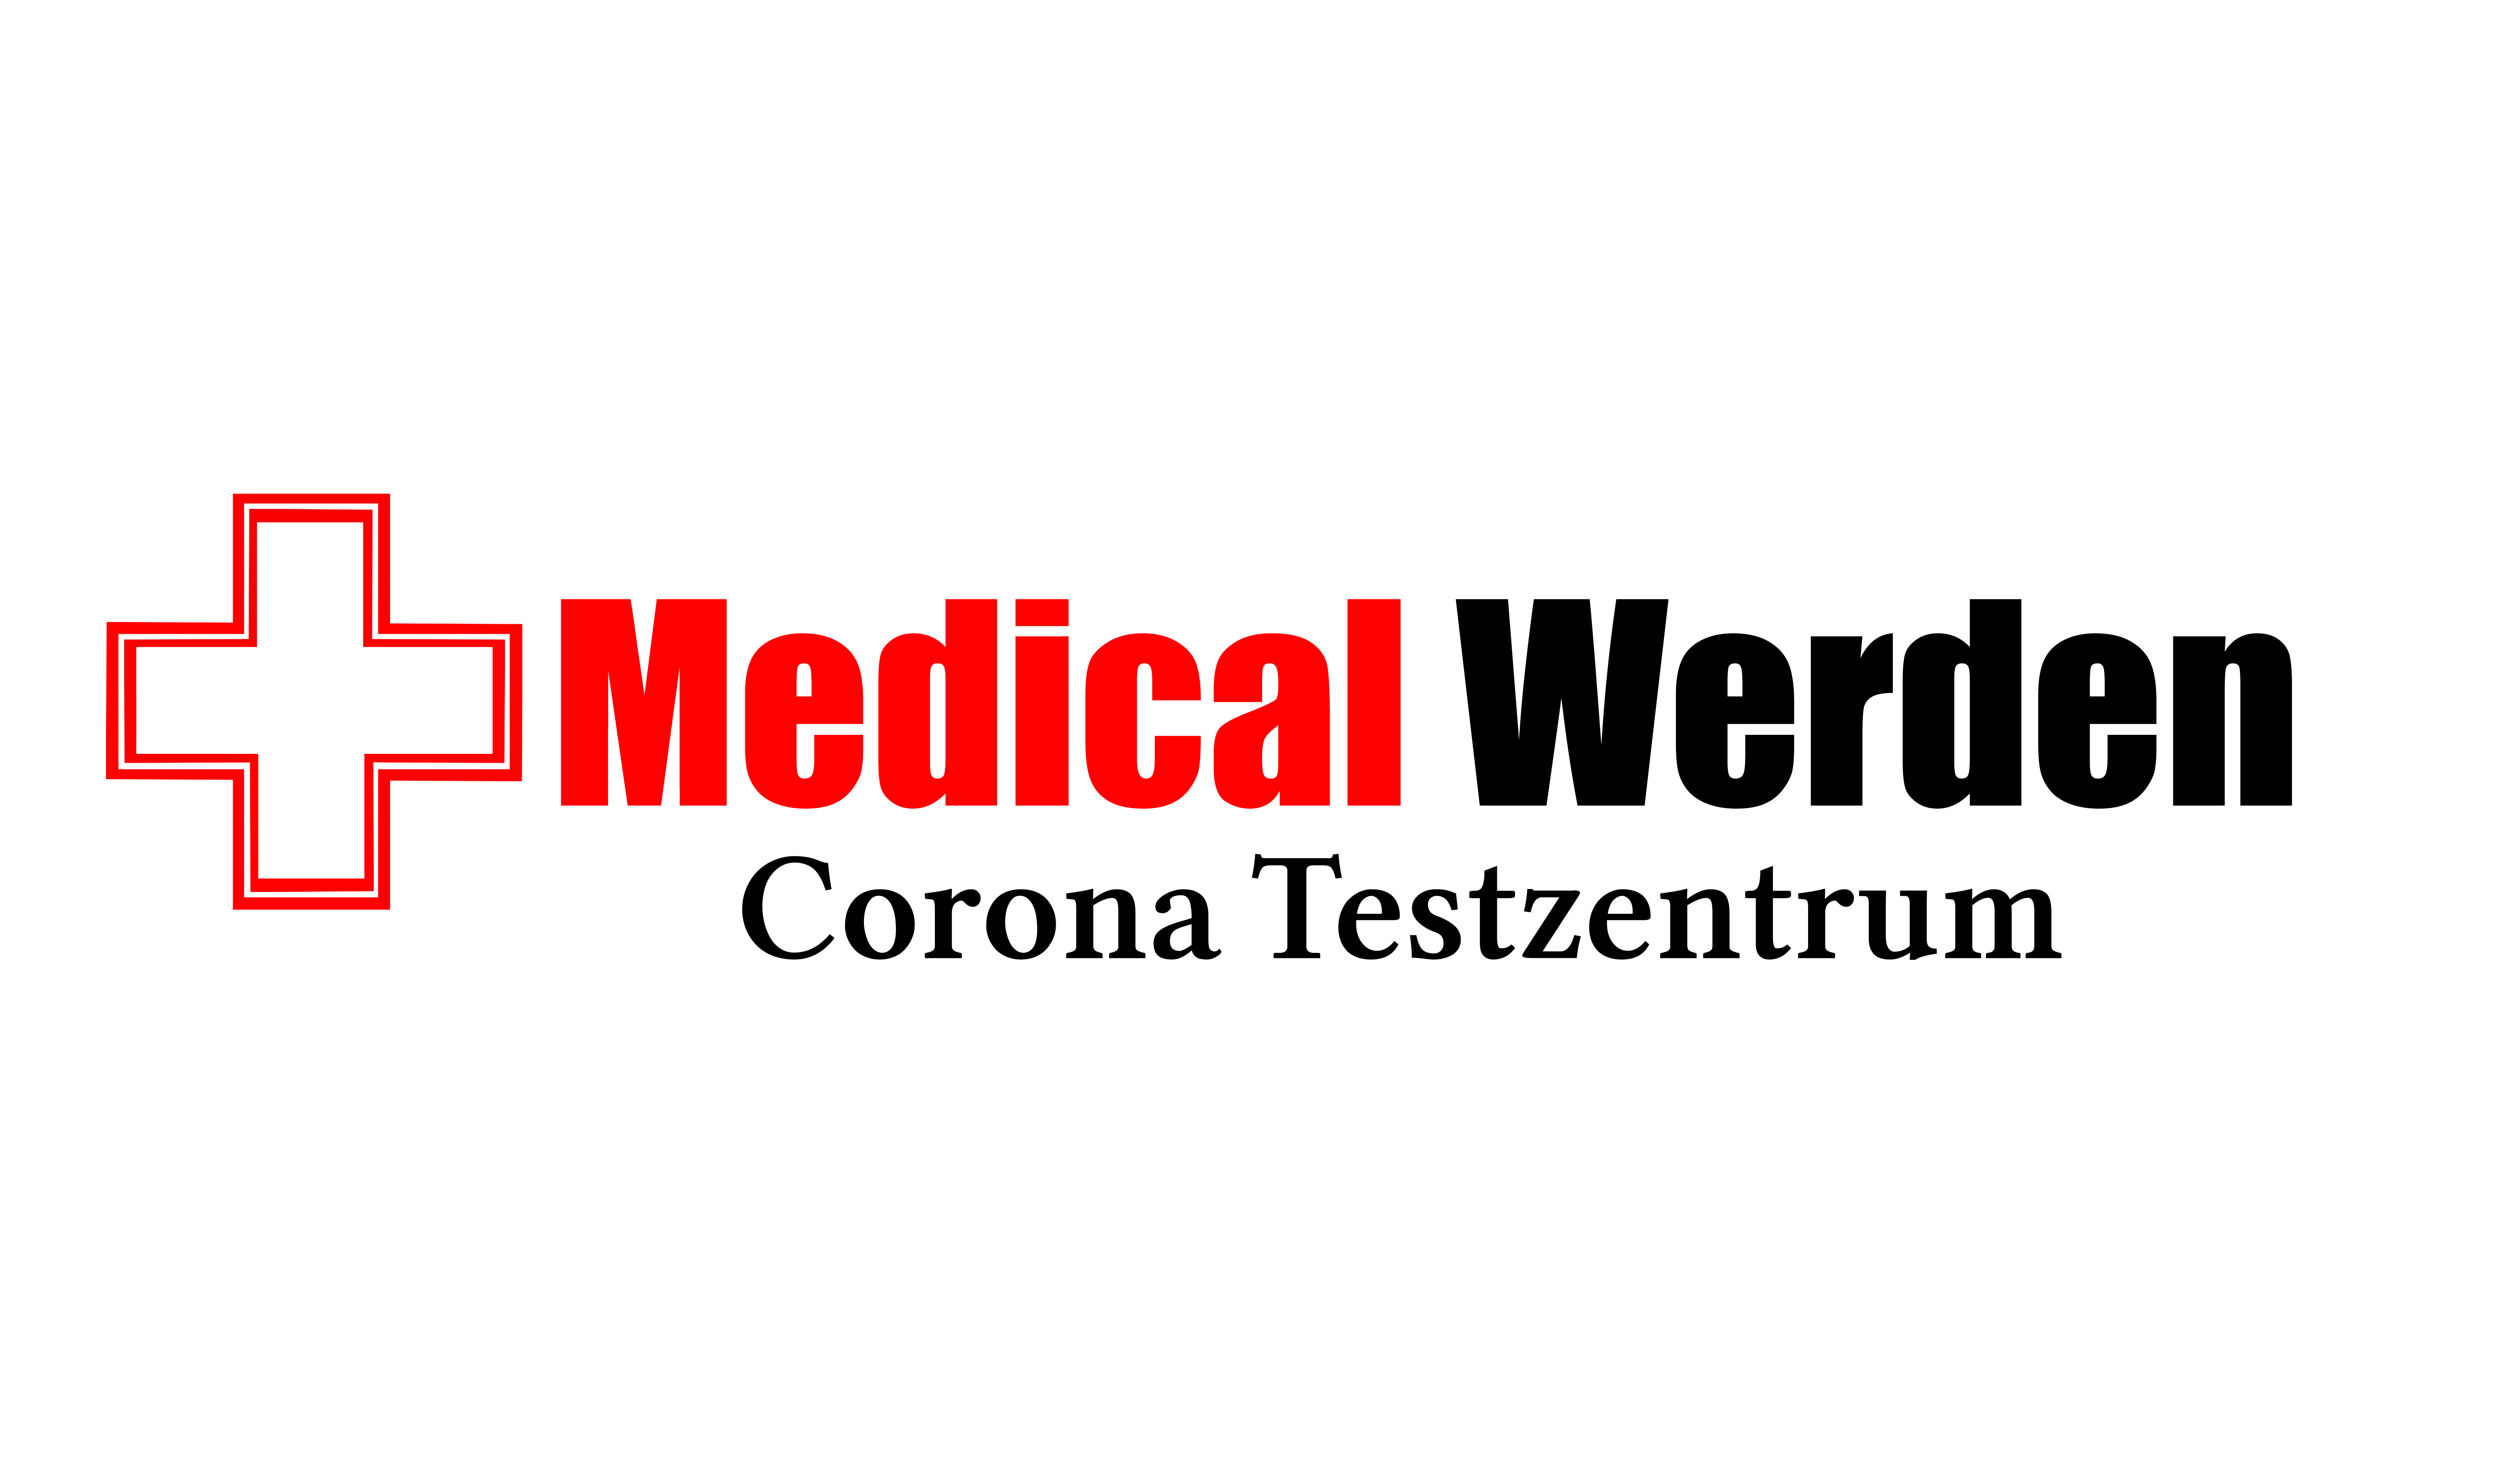 Corona Testzentrum Medical Werden